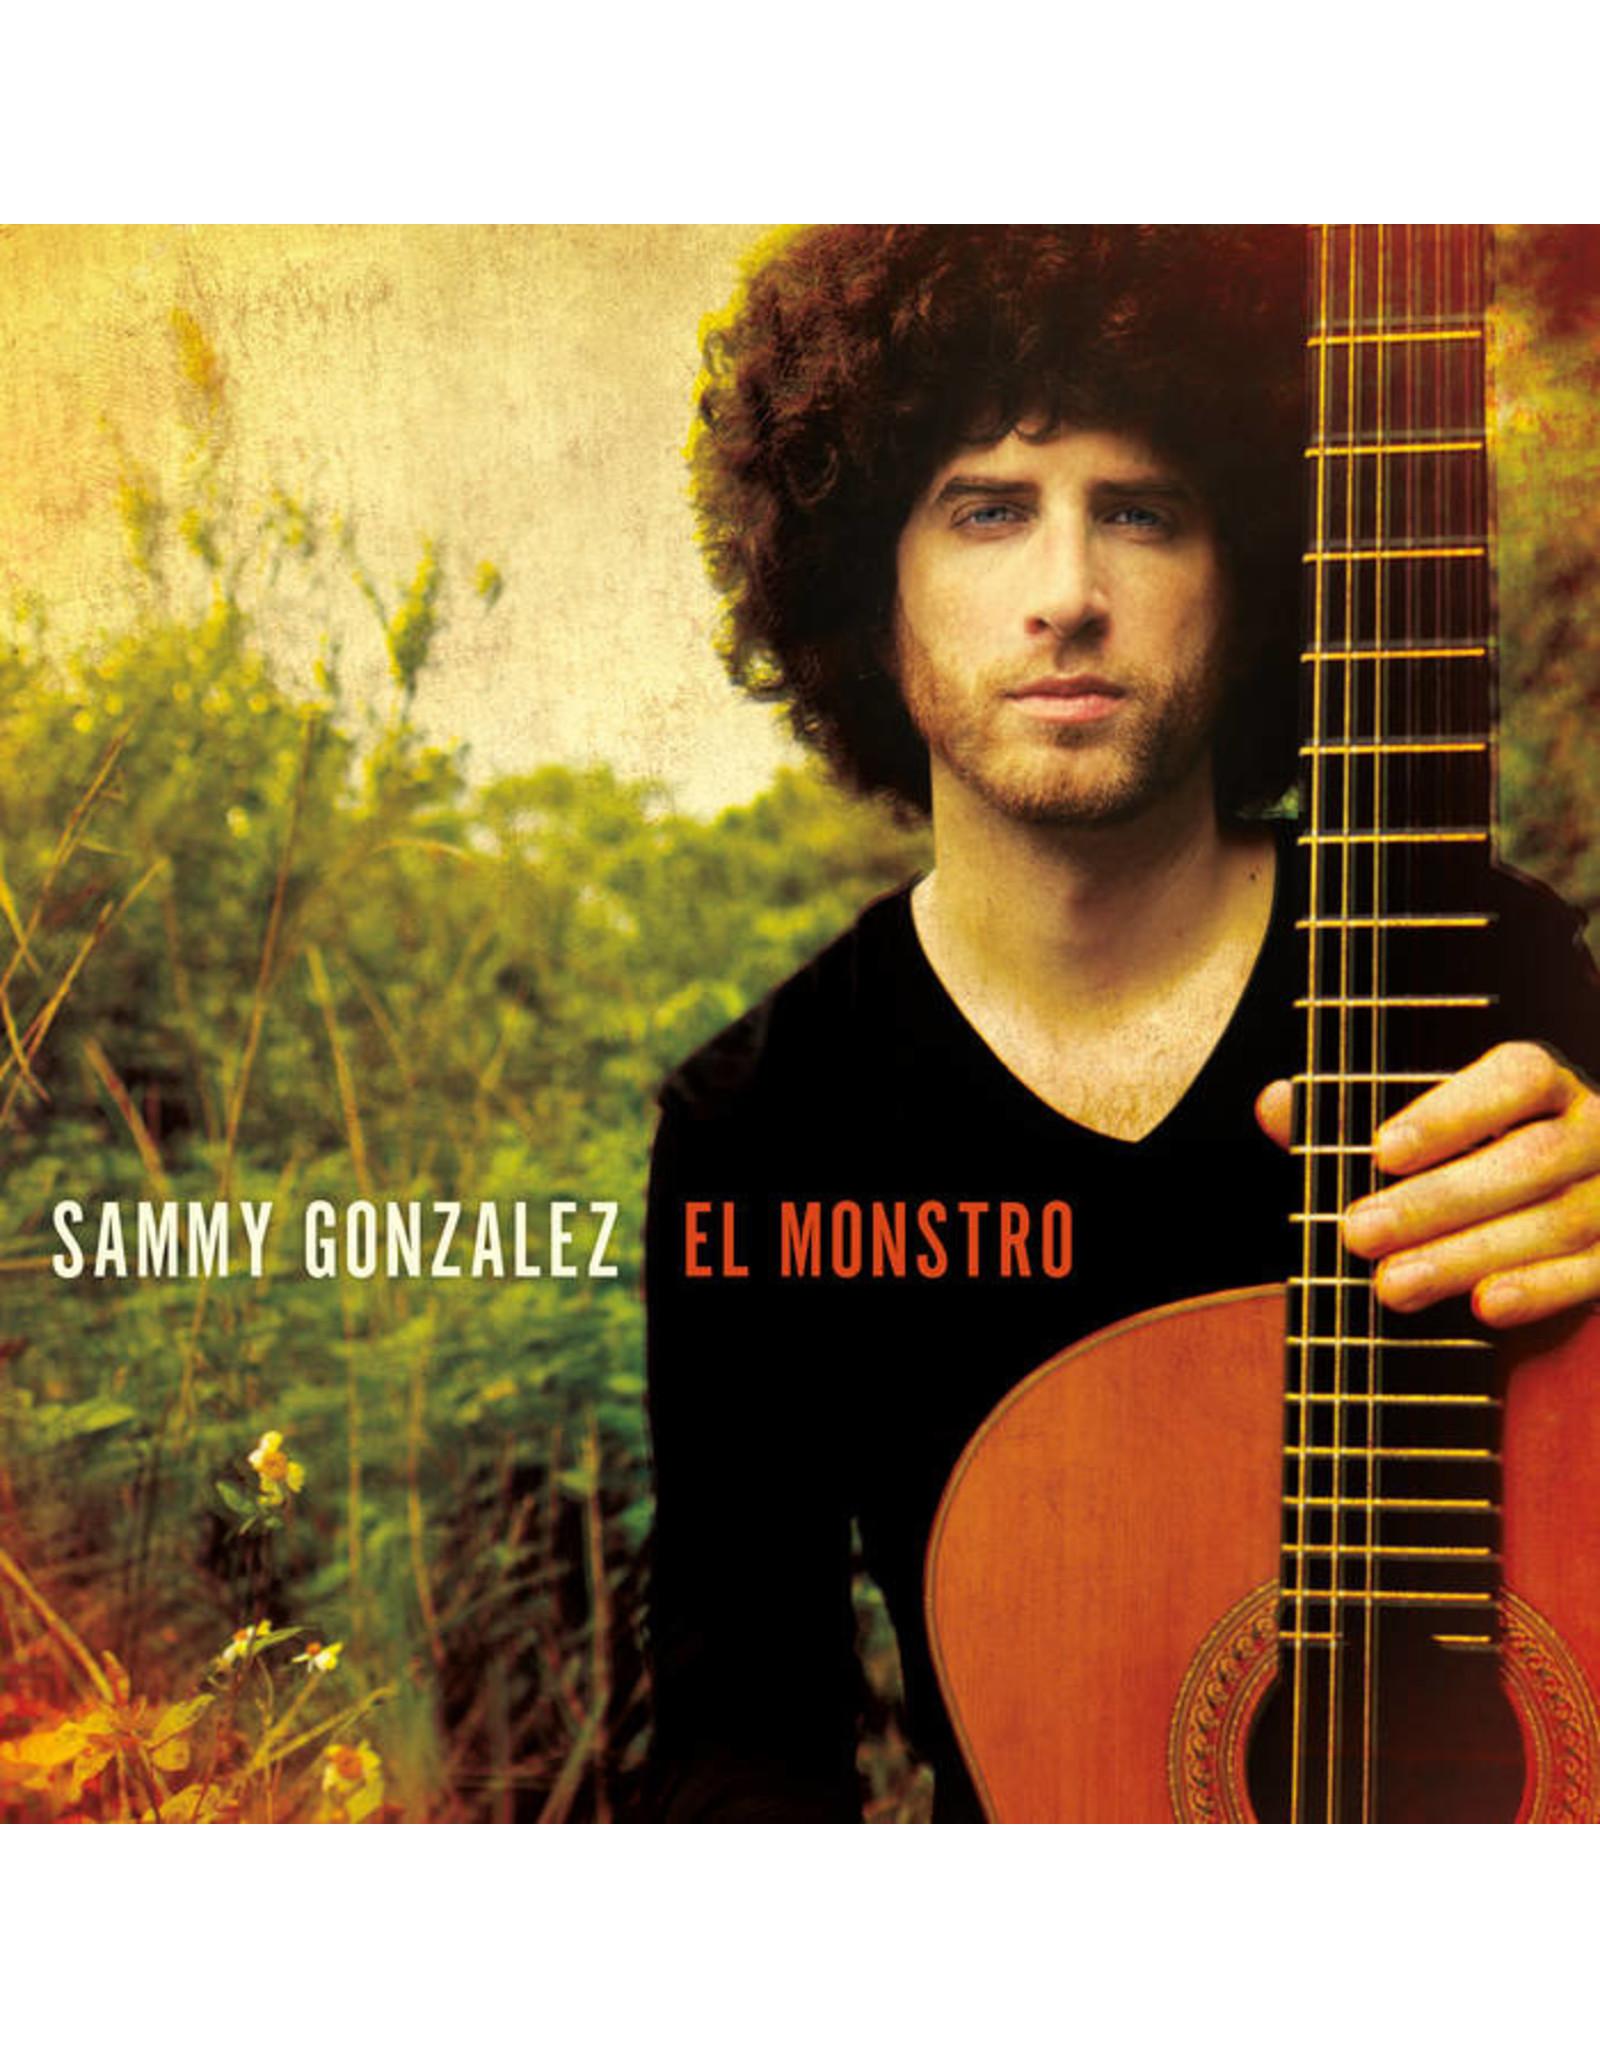 New Vinyl Sammy Gonzalez - El Monstro LP